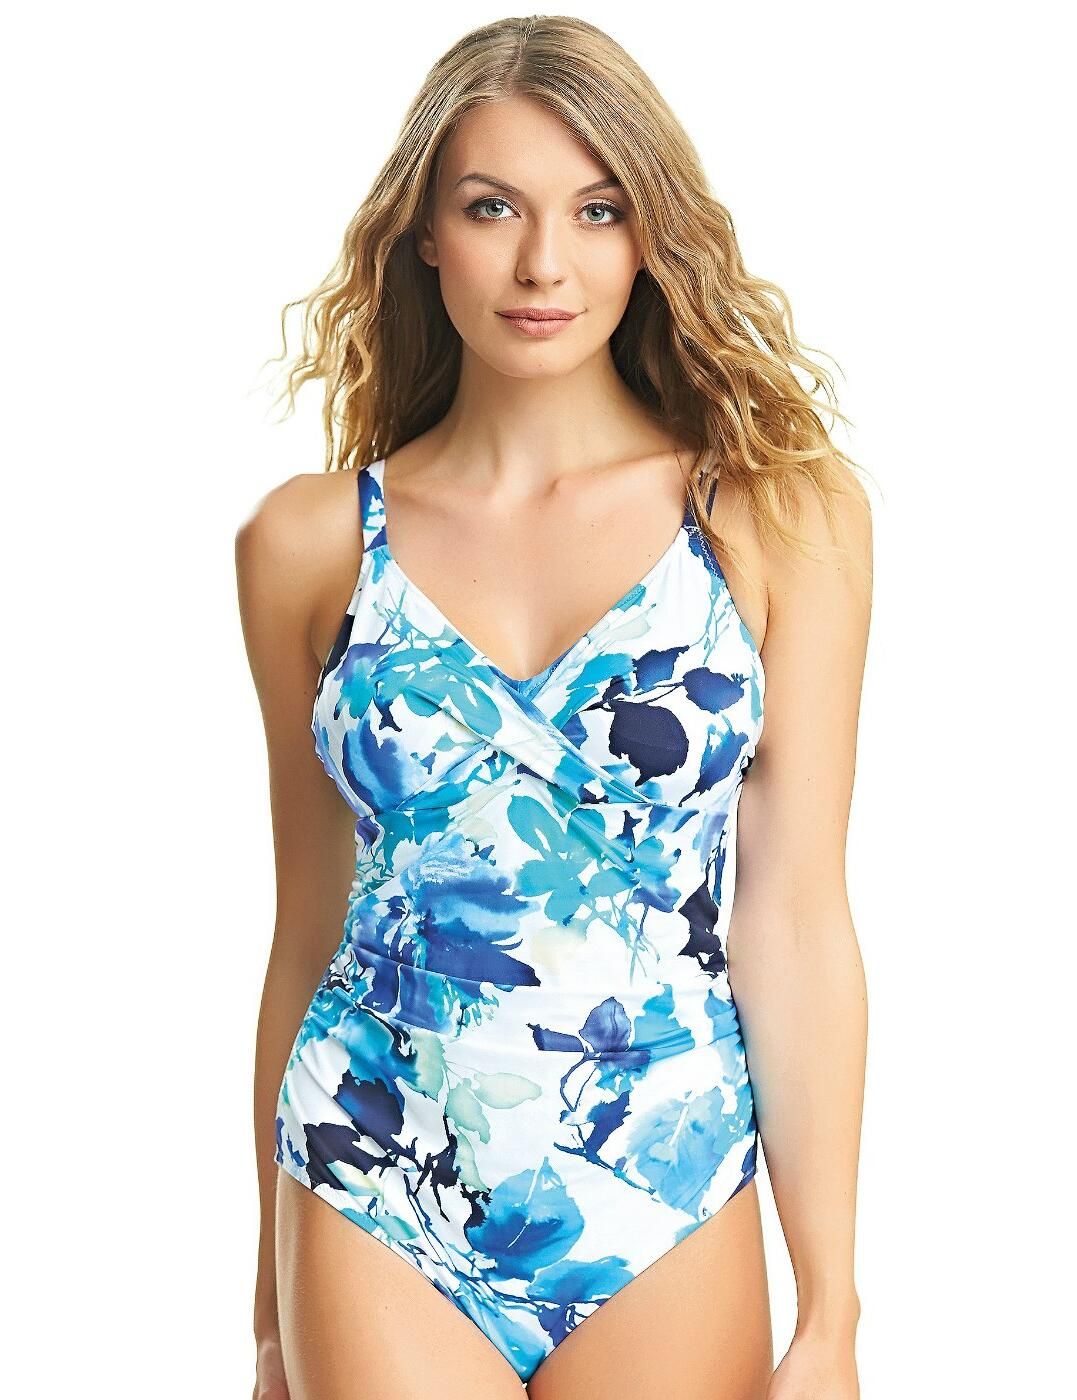 6373 Fantasie Capri Cross Front Smoothing Swimsuit - 6373 Surf